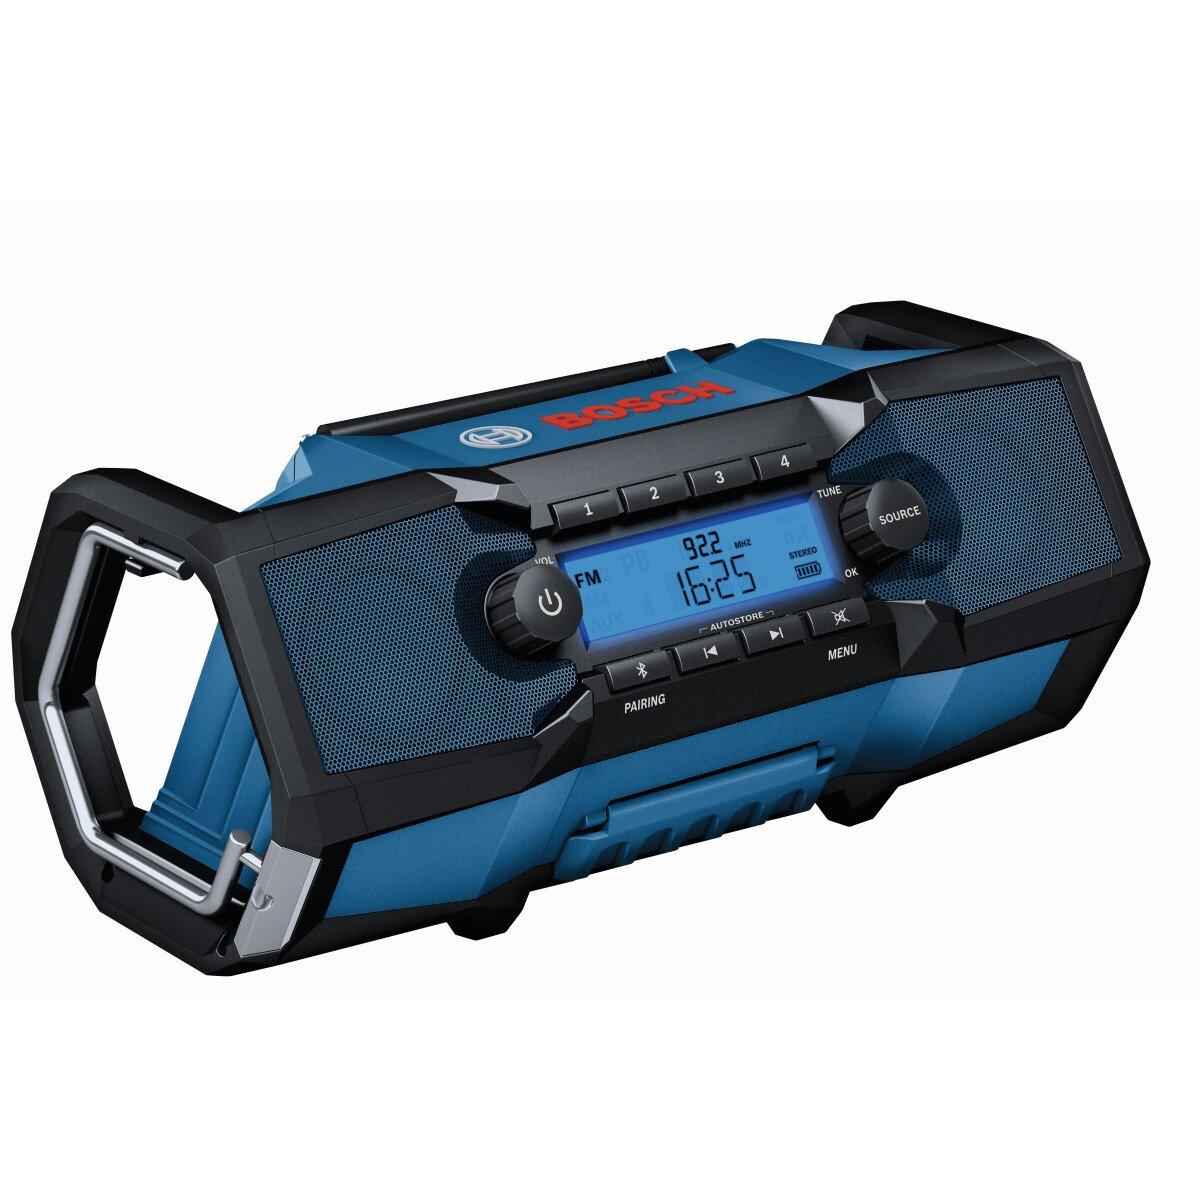 Bosch GBP 18 V-2 C 18v Body Only / 230v Jobsite Bluetooth Radio Connection Ready in Carton